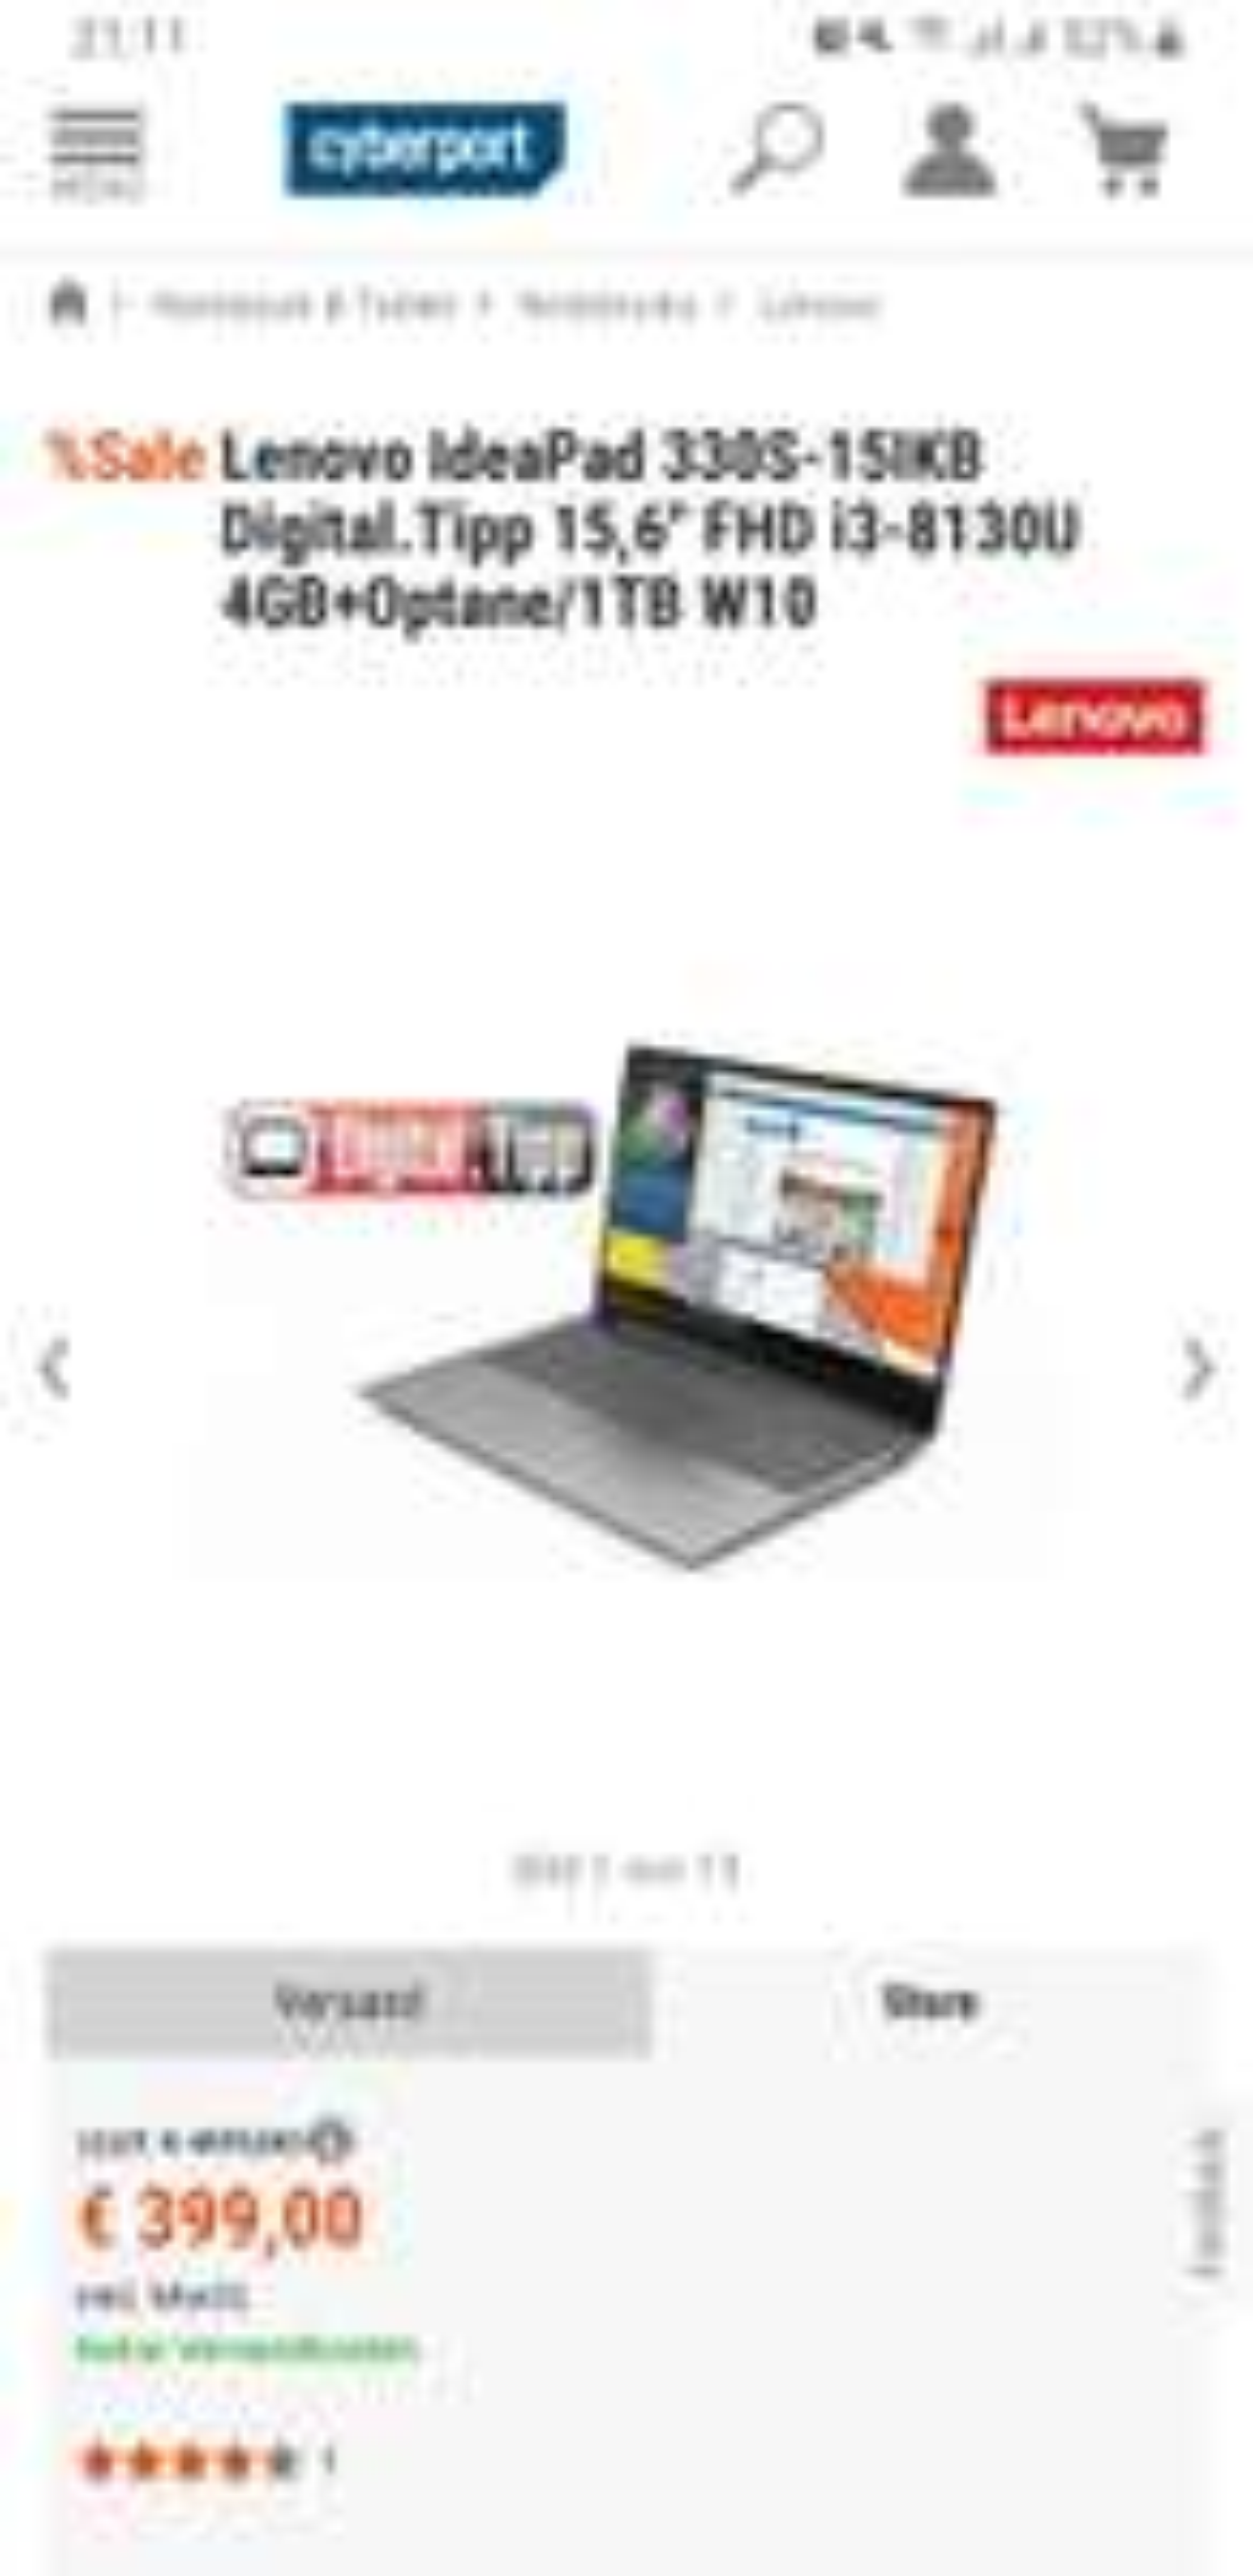 "[ebay/Cyberport] 15,4""Zoll Lenovo Ideapad 330s| Full HD | i3 8130U | 4GB Ram + Optane | 1 TB HDD | HD620 | Windows 10 | Versandkostenfrei"